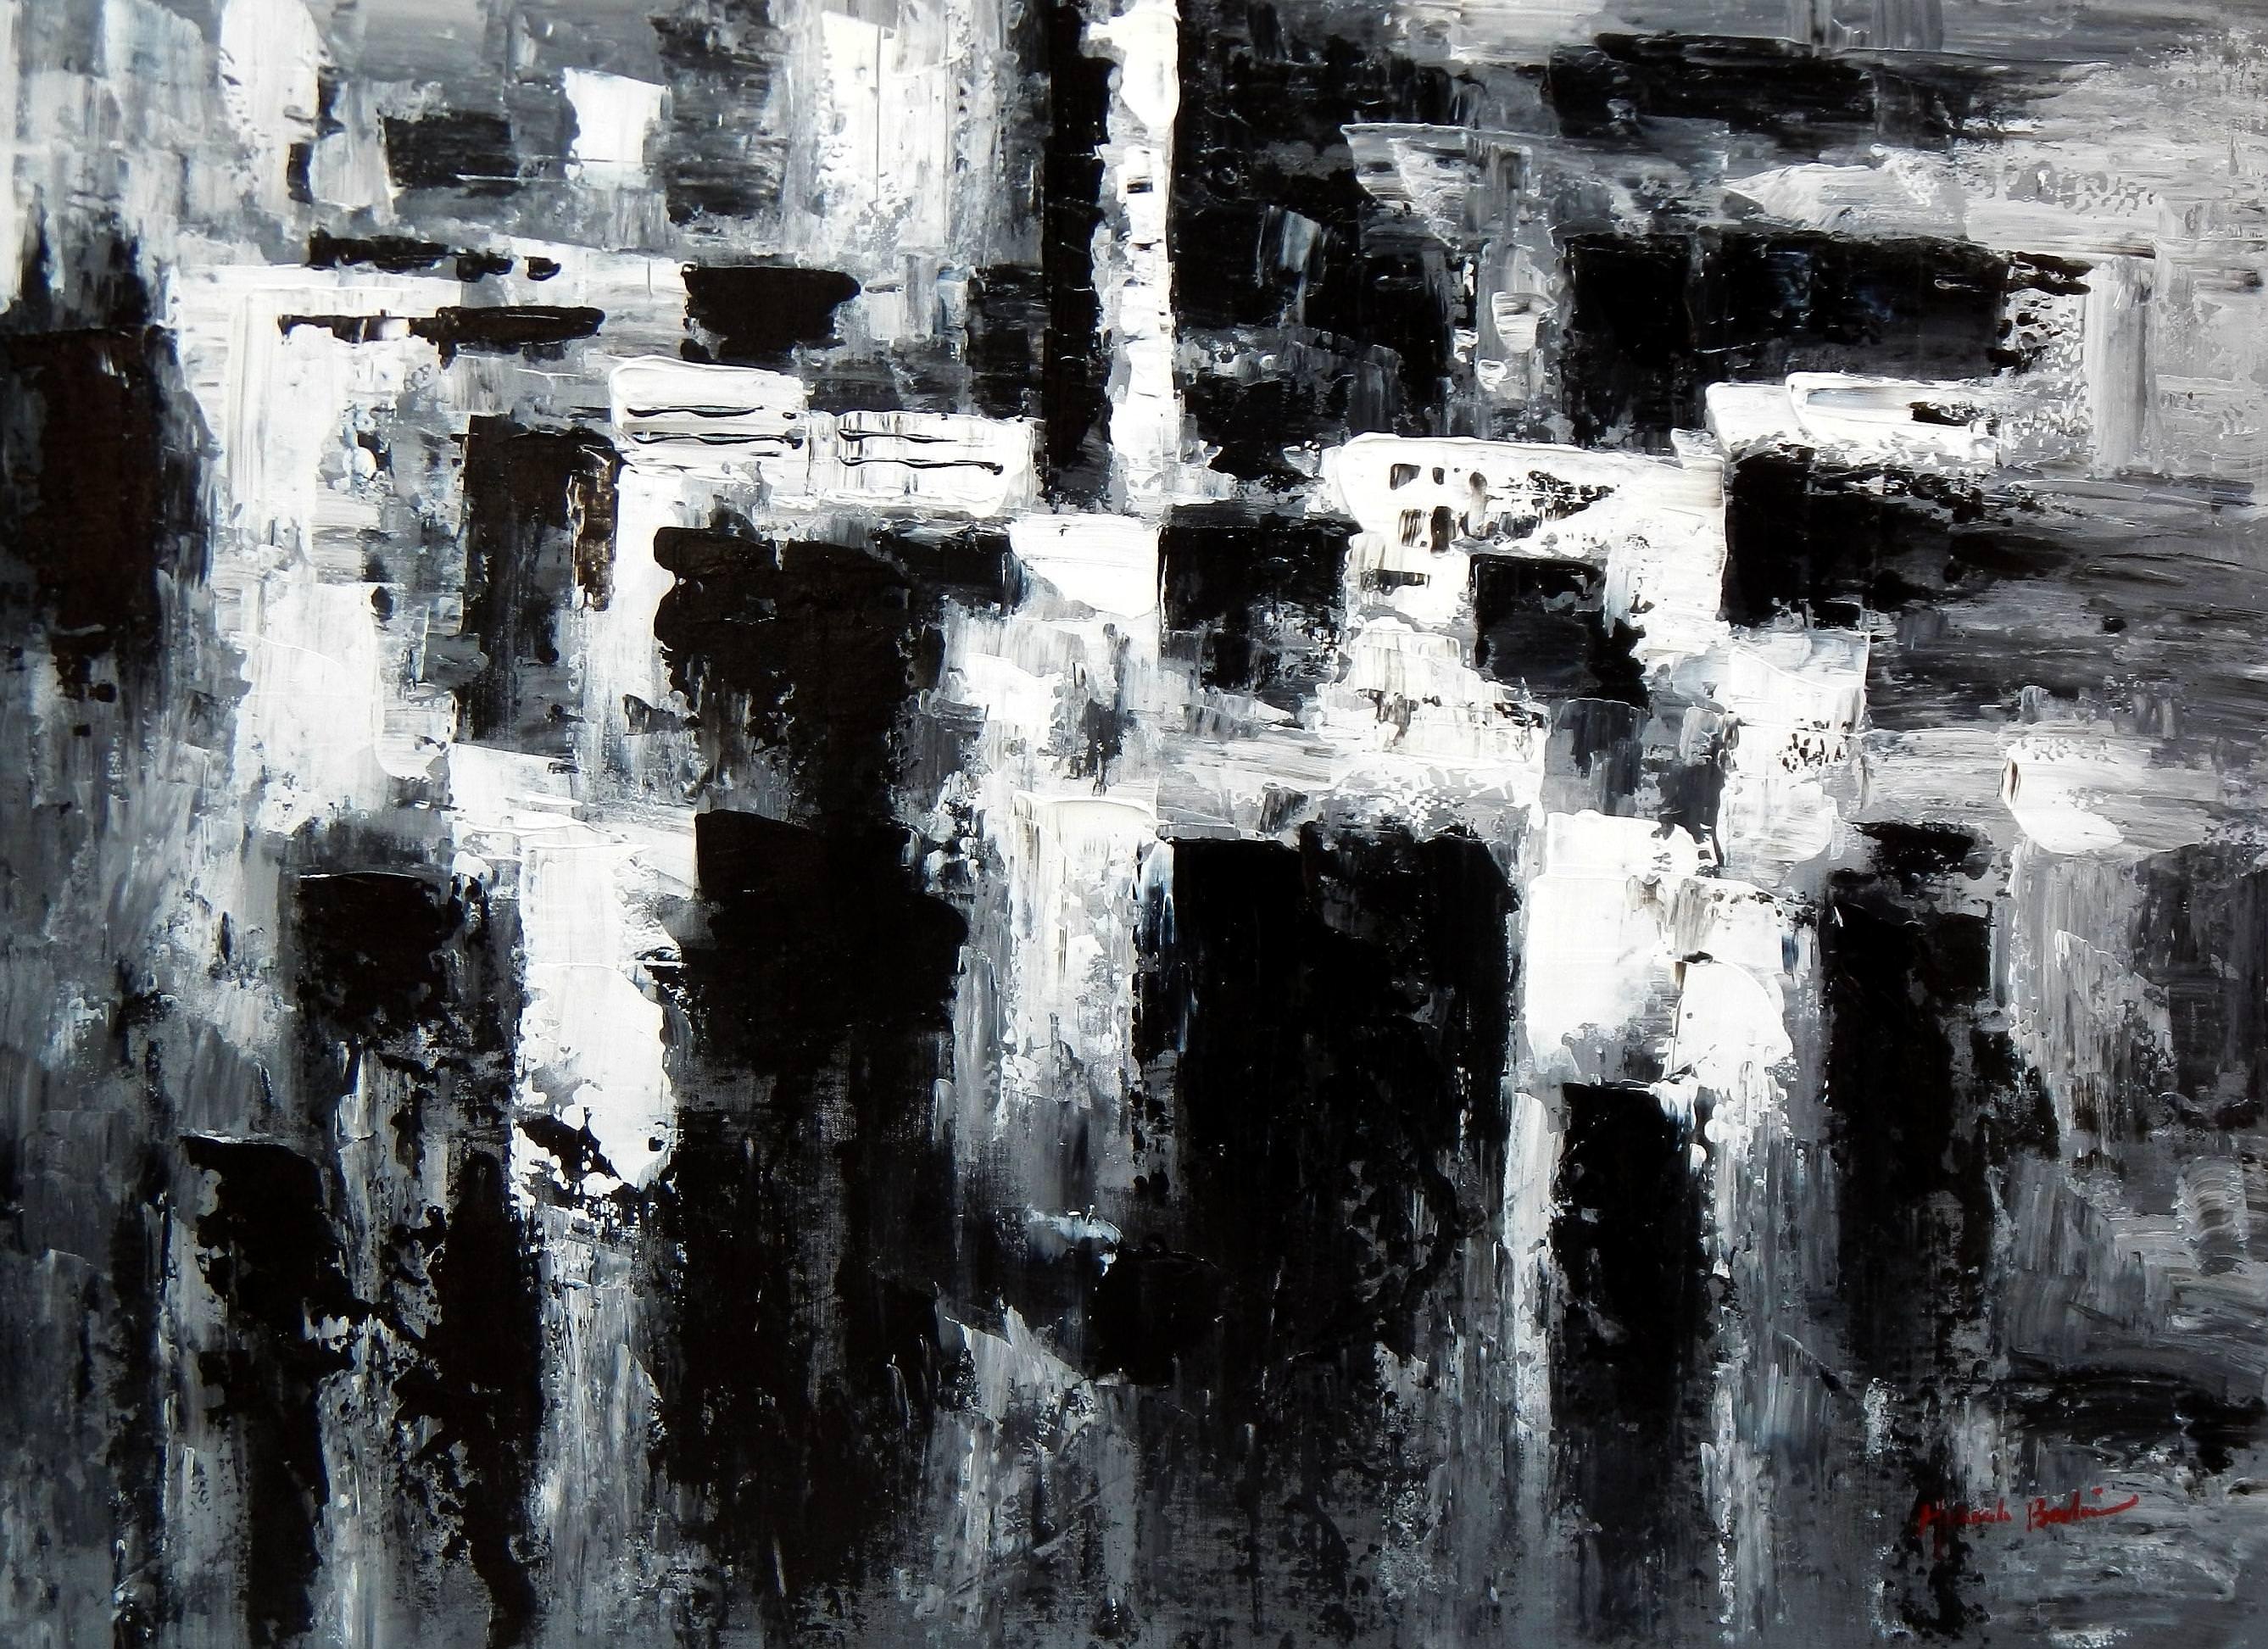 Abstrakt - Nacht in New York i92970 80x110cm Ölgemälde handgemalt